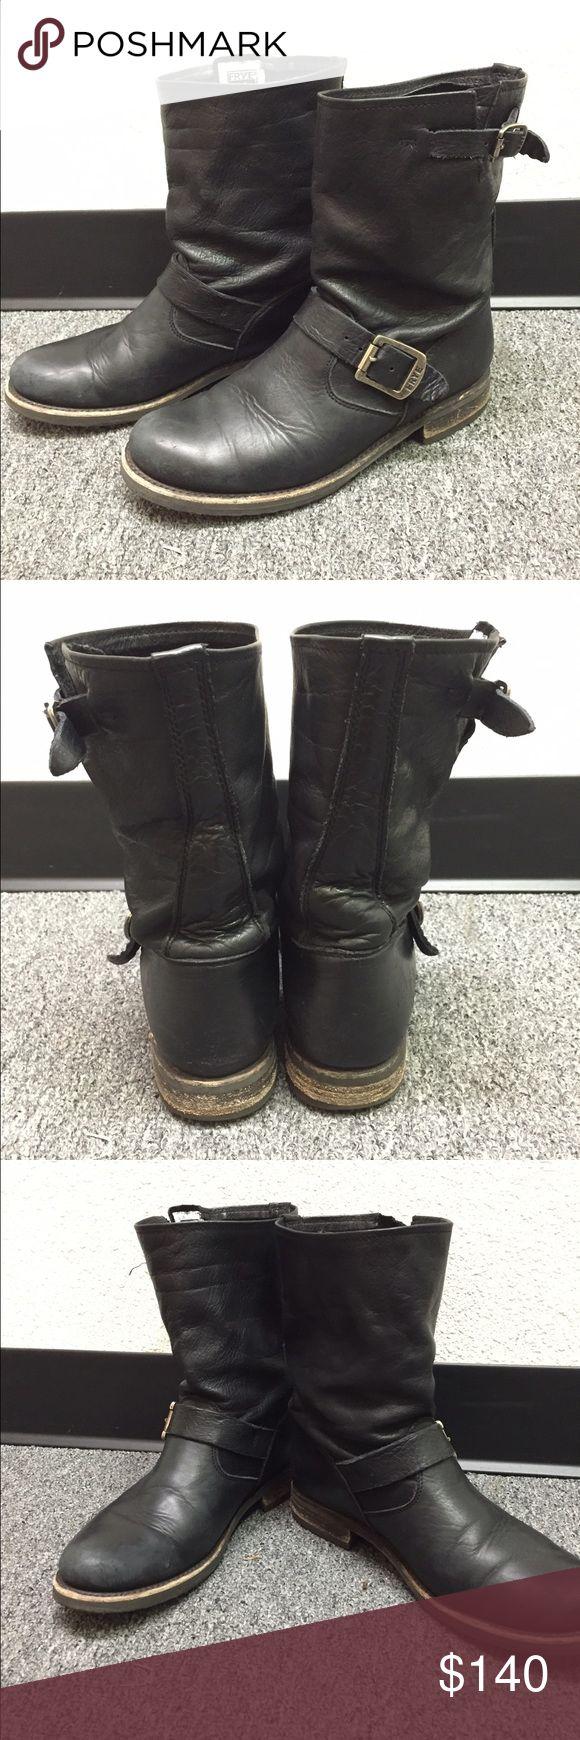 Frye Veronica Short Engineer Biker Boots 8 Frye Veronica Short Engineer Biker Boots. Size 8. Black Frye Shoes